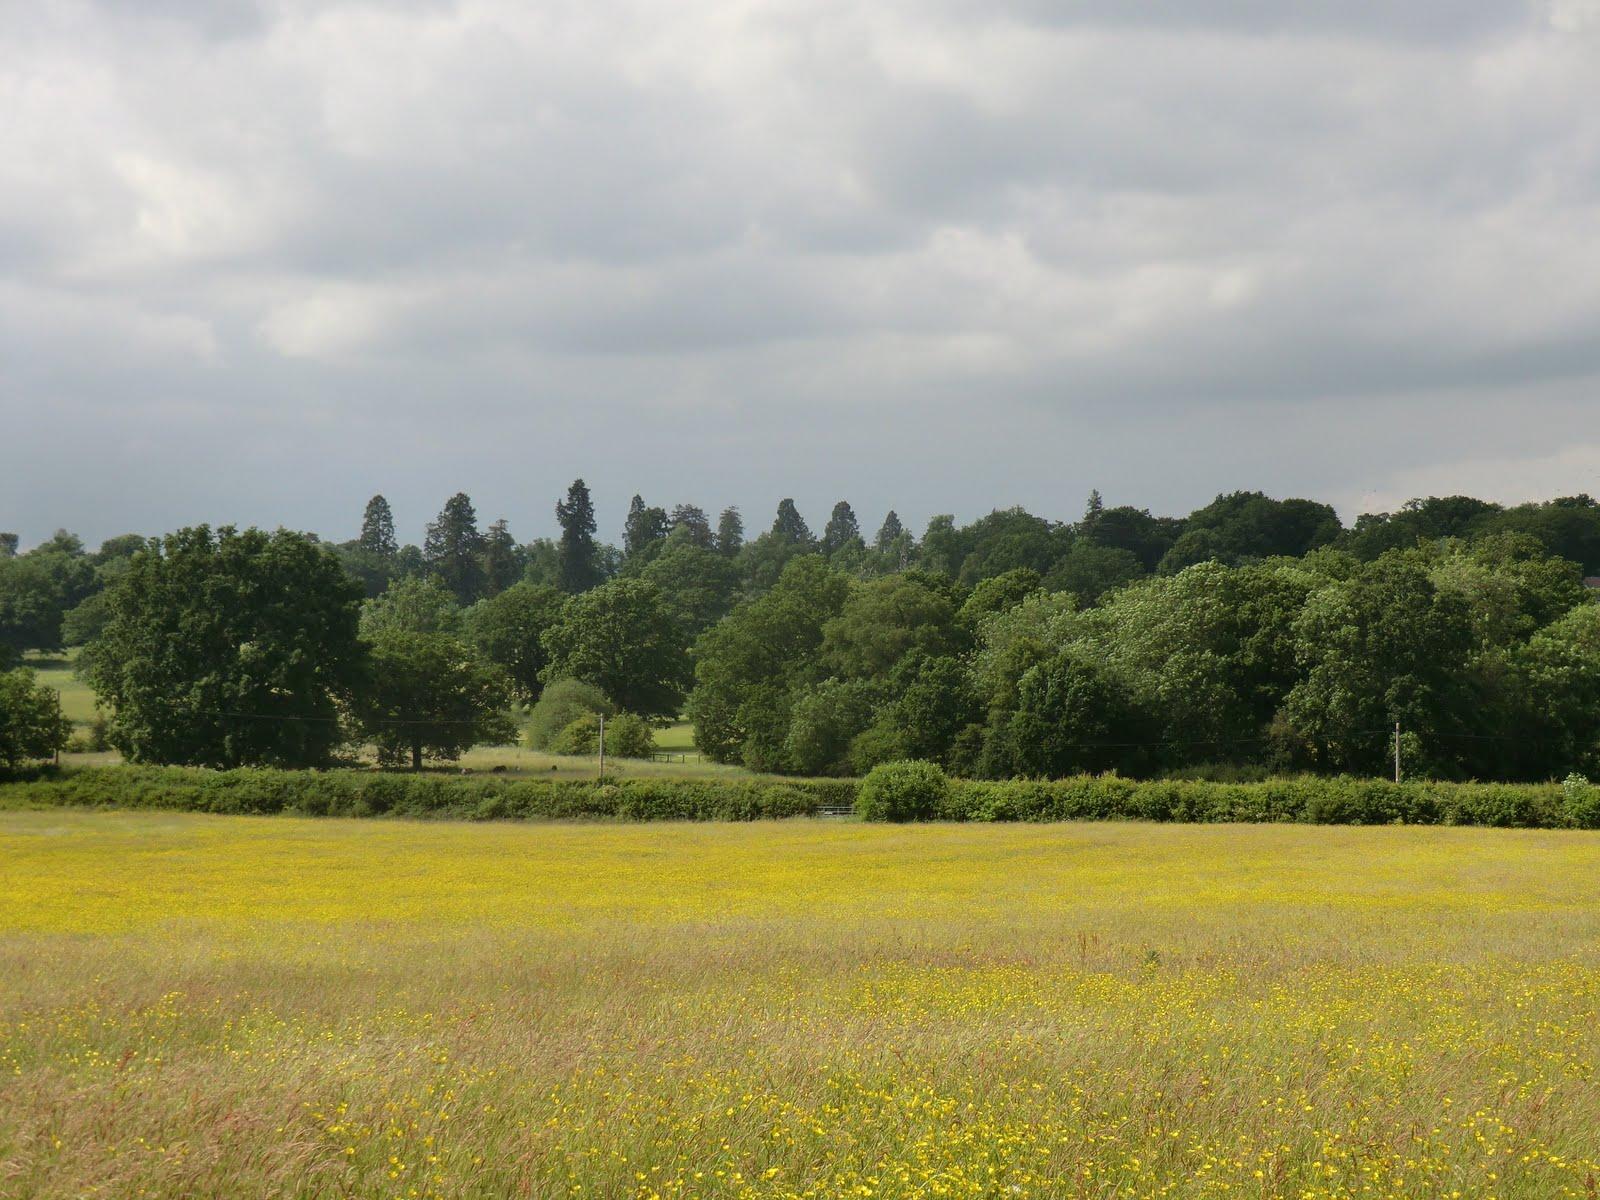 CIMG8604 Buttercup meadow, Hildenborough